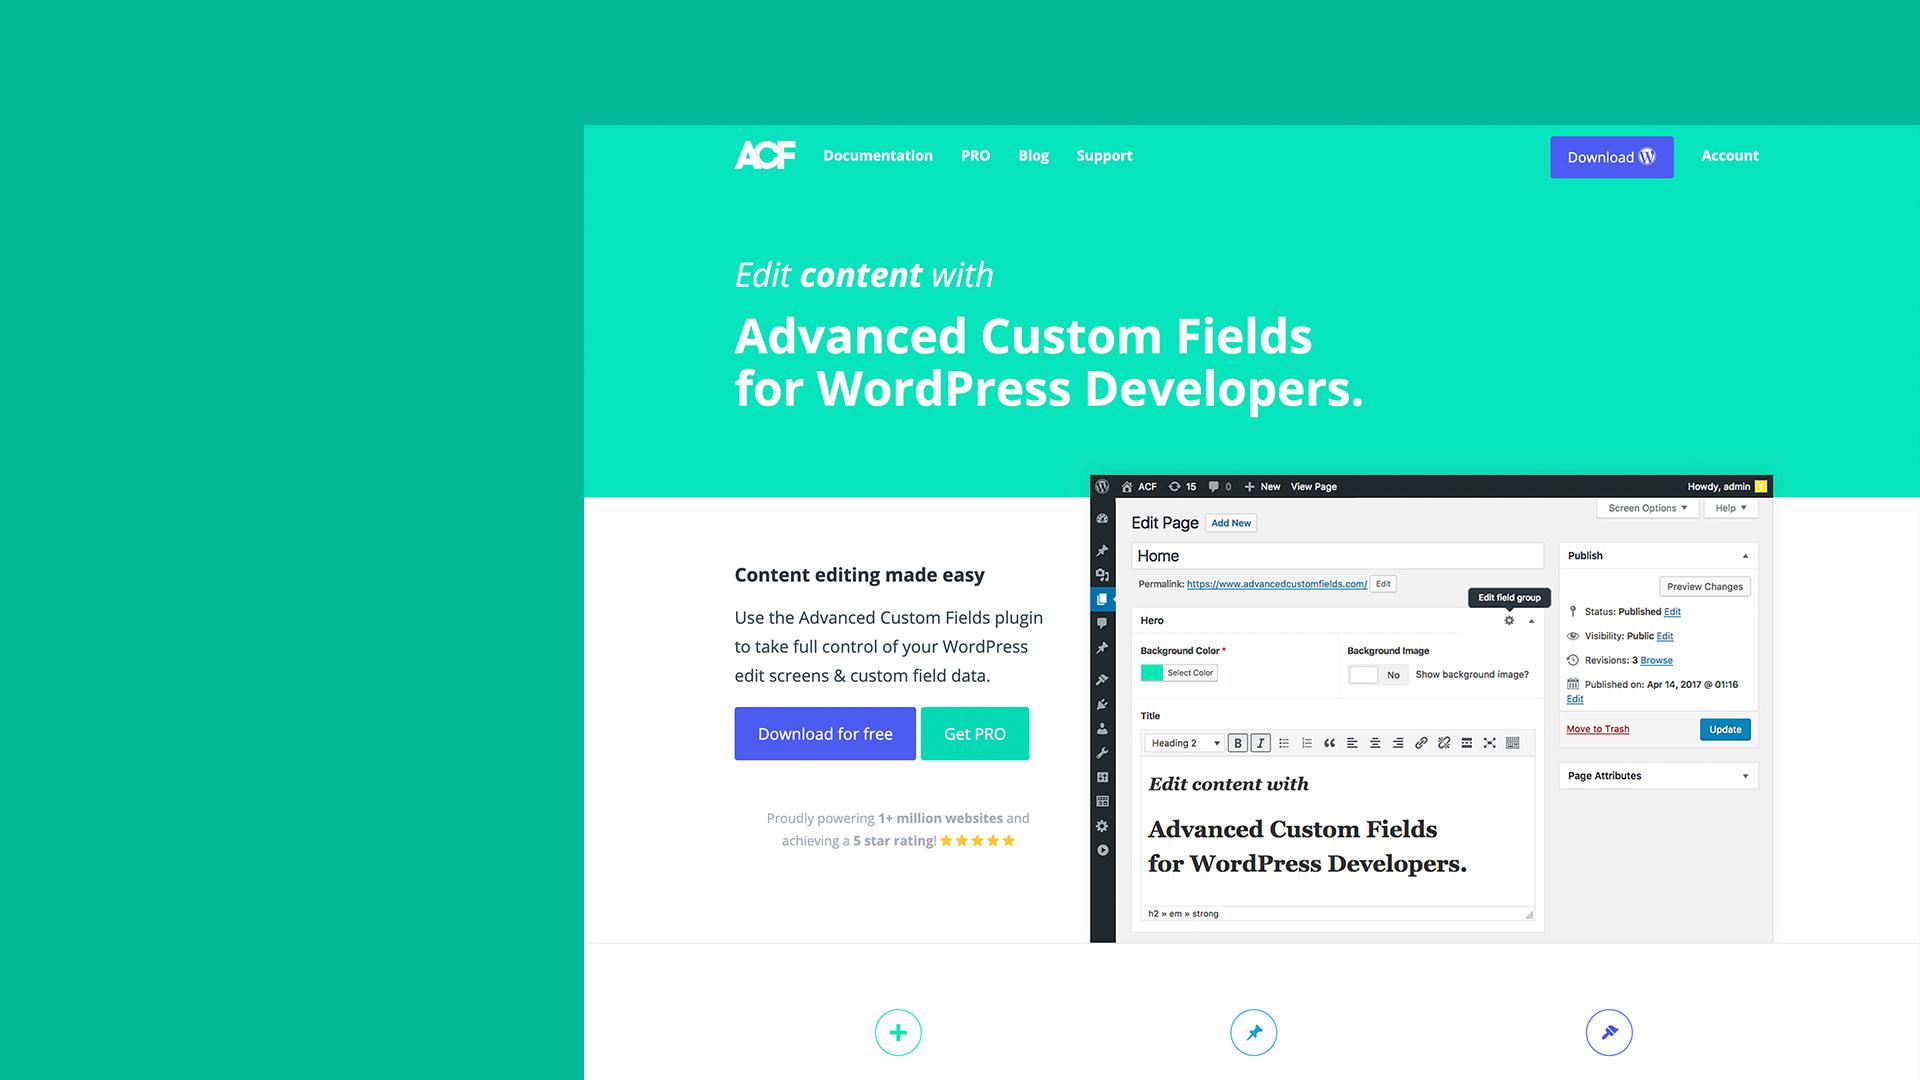 The Advanced Custom Fields website.